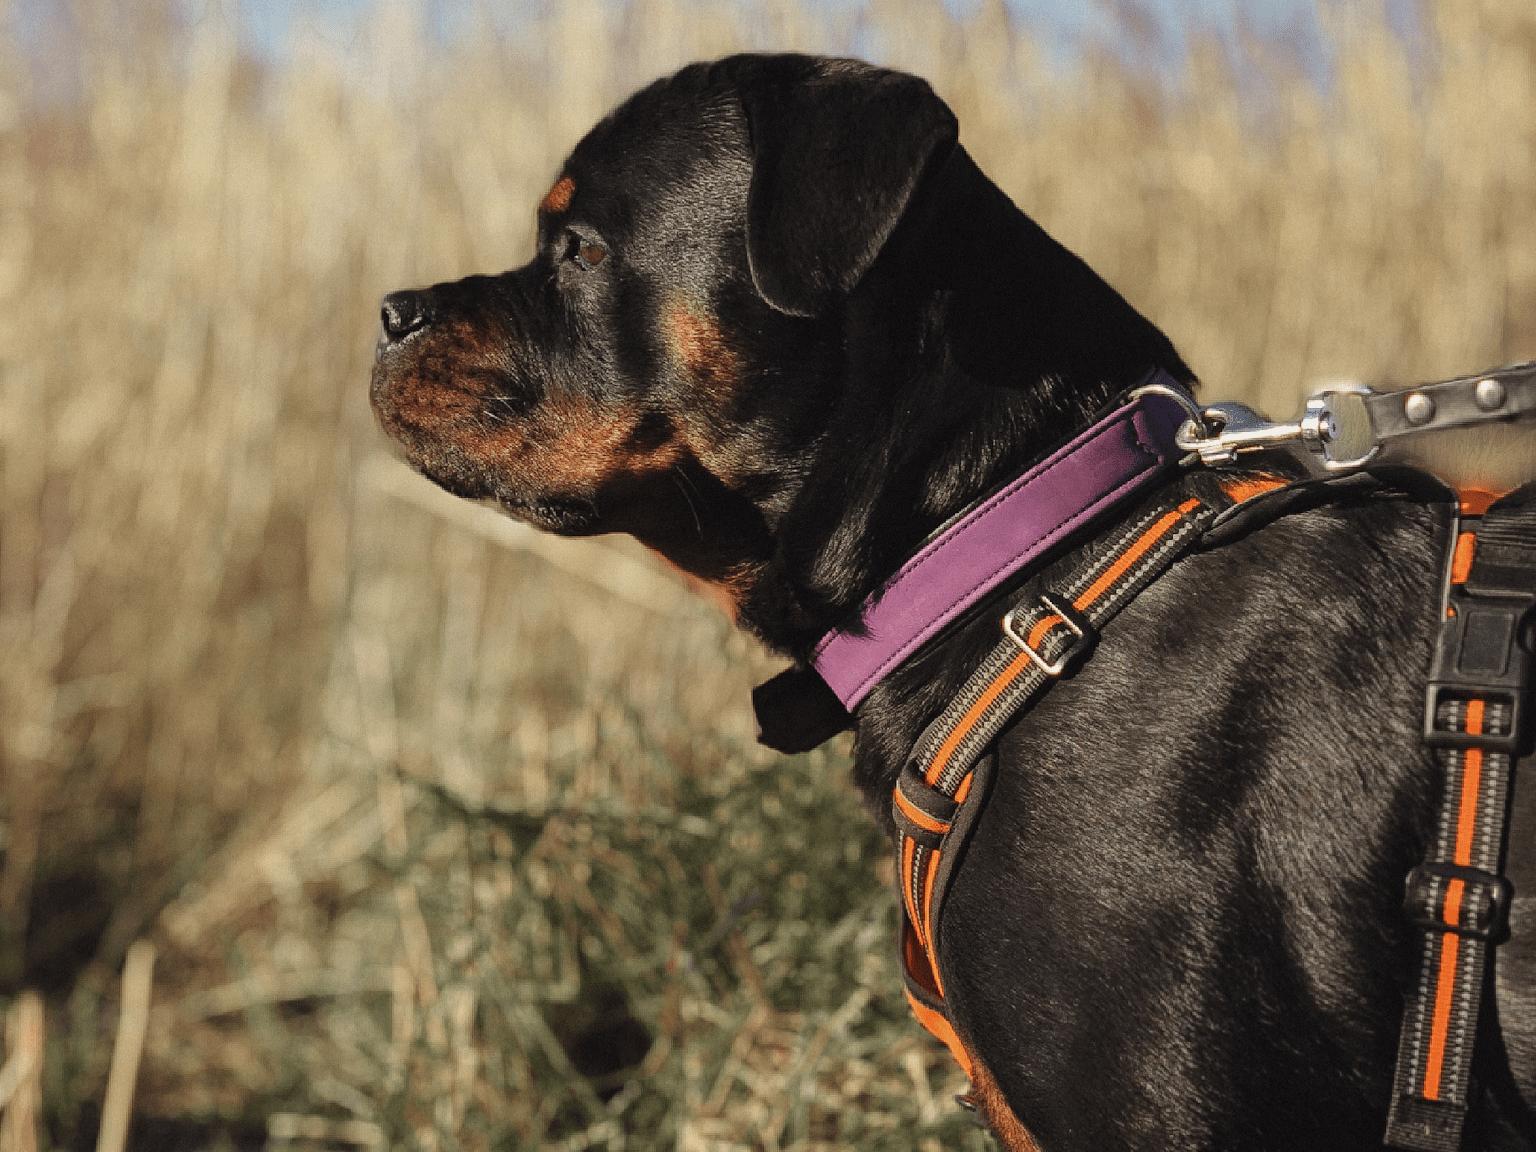 Rottweiler with shiny coat.